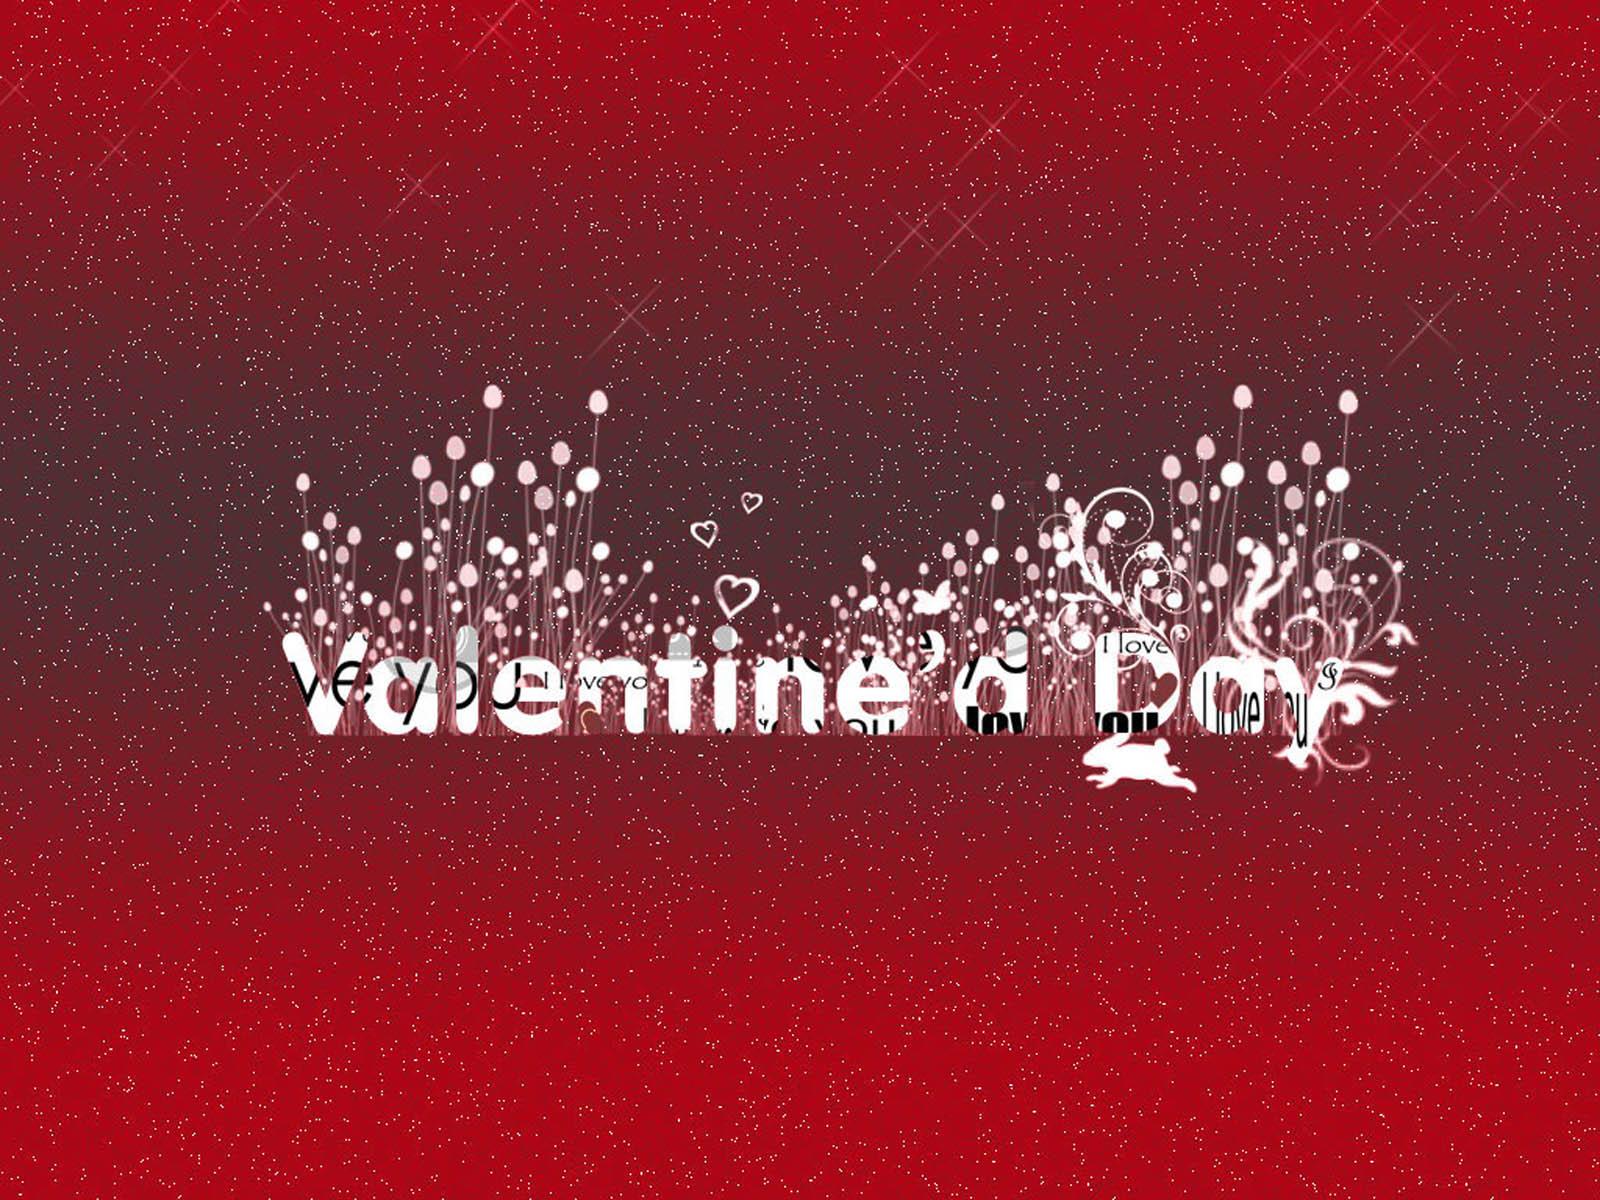 valentines day background wallpaper - photo #14